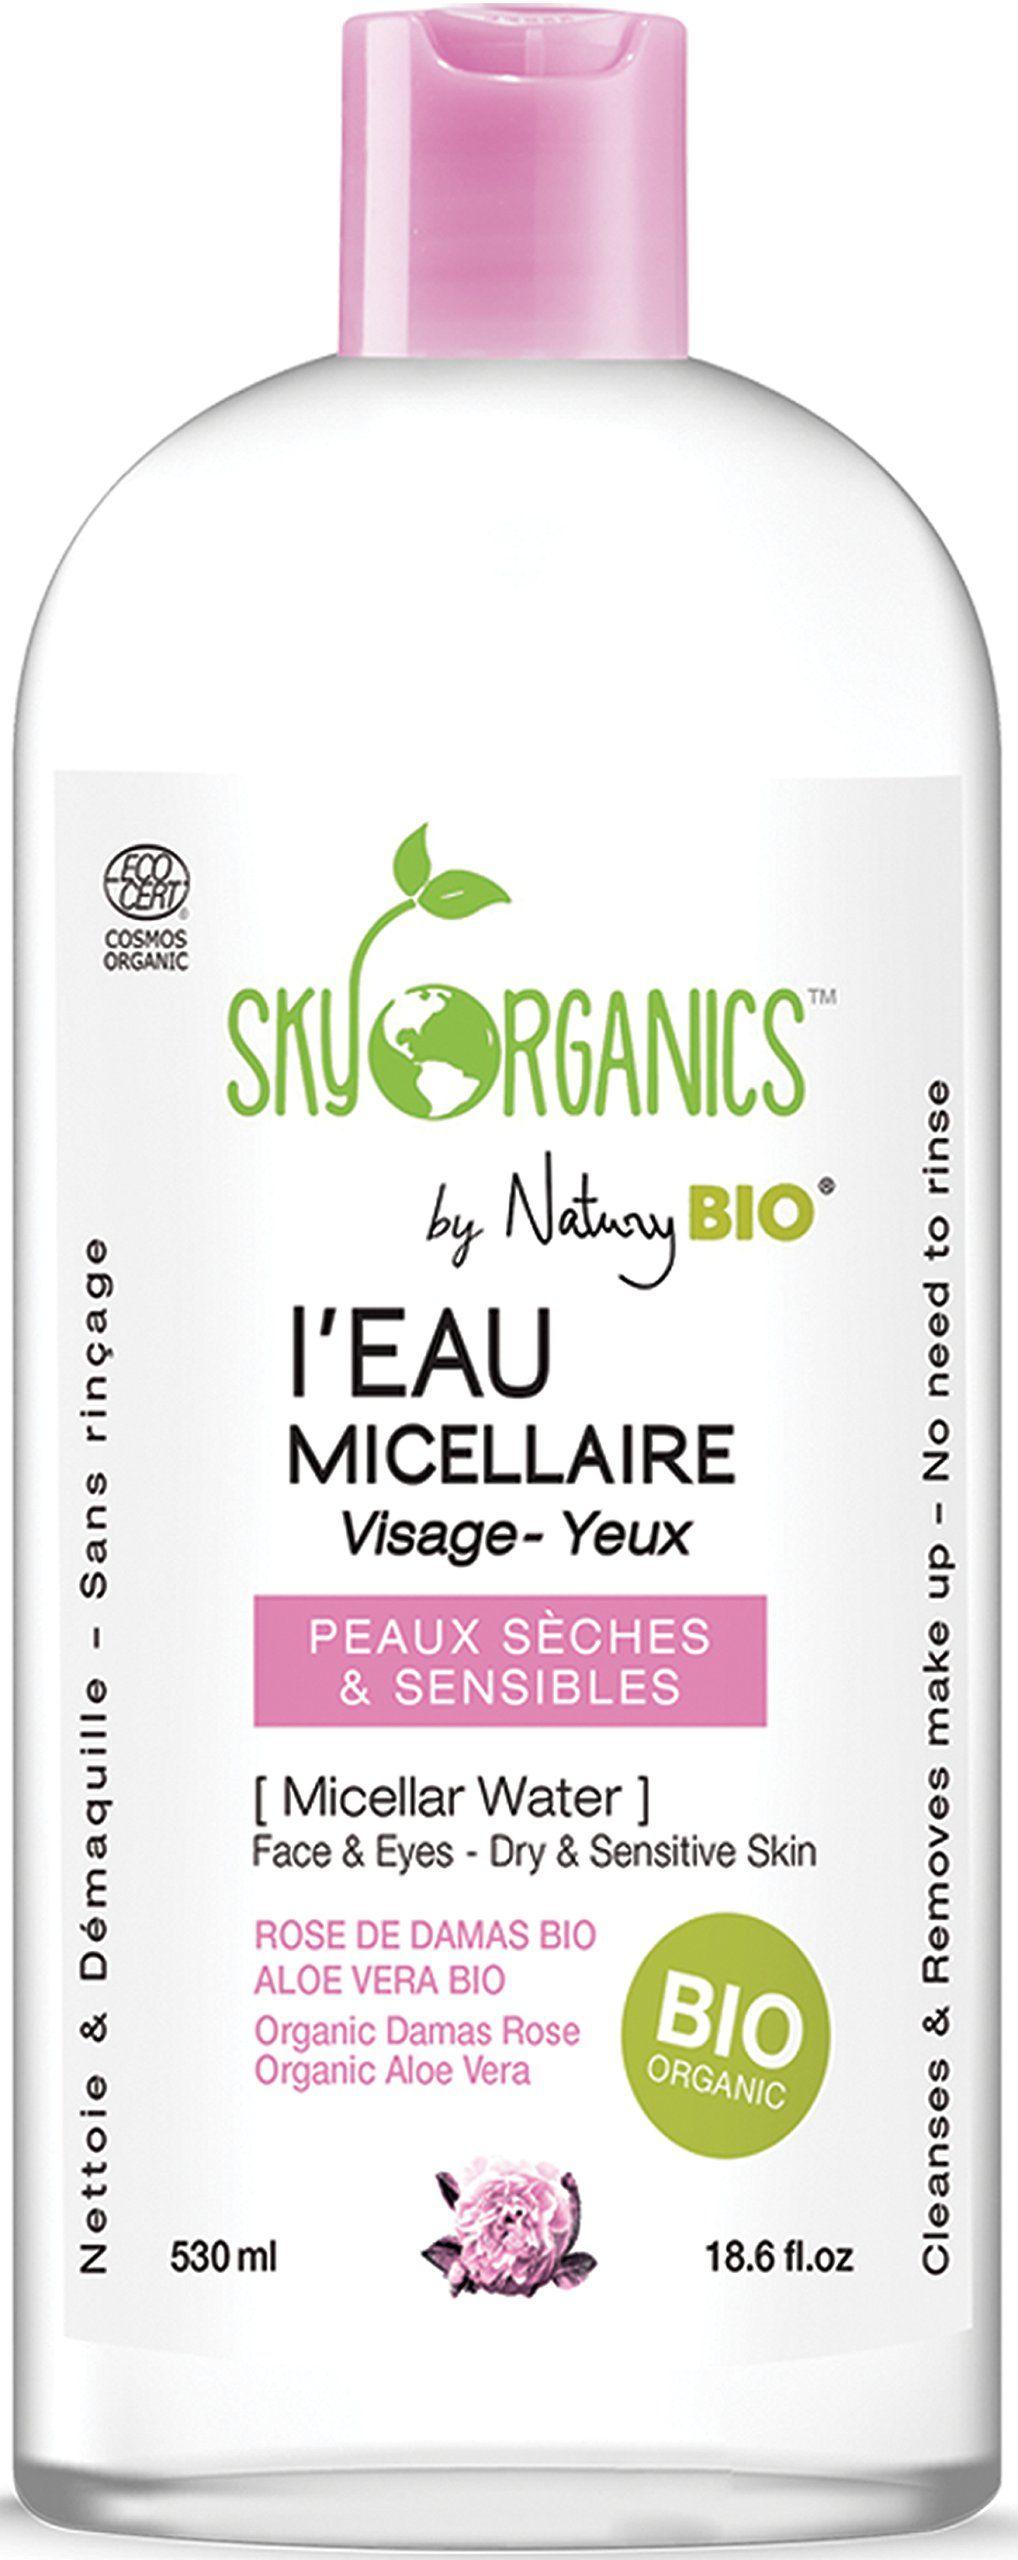 Organic Micellar Cleansing Water by Sky Organics Sensitive